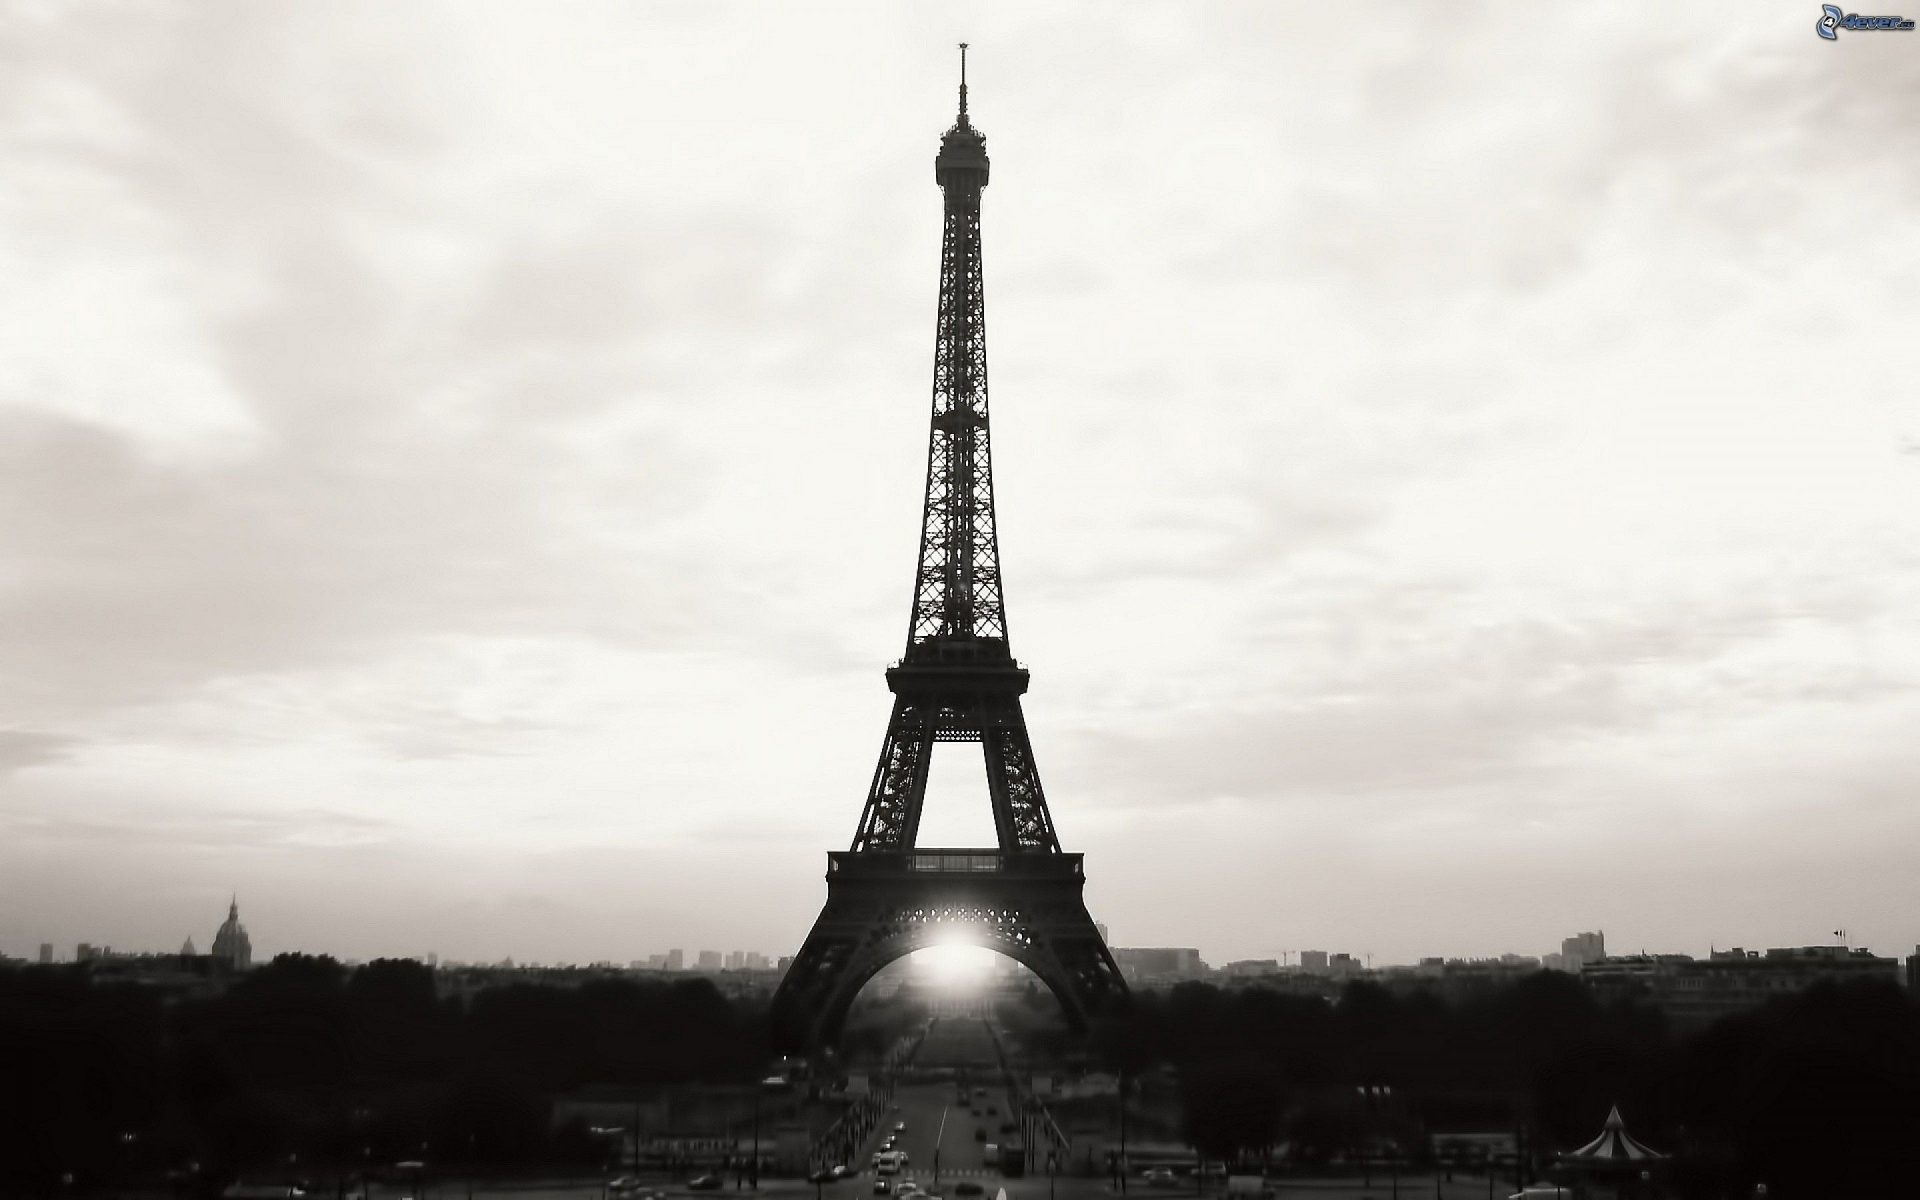 torre-eiffel,-paris,-francia,-blanco-y-negro-170284